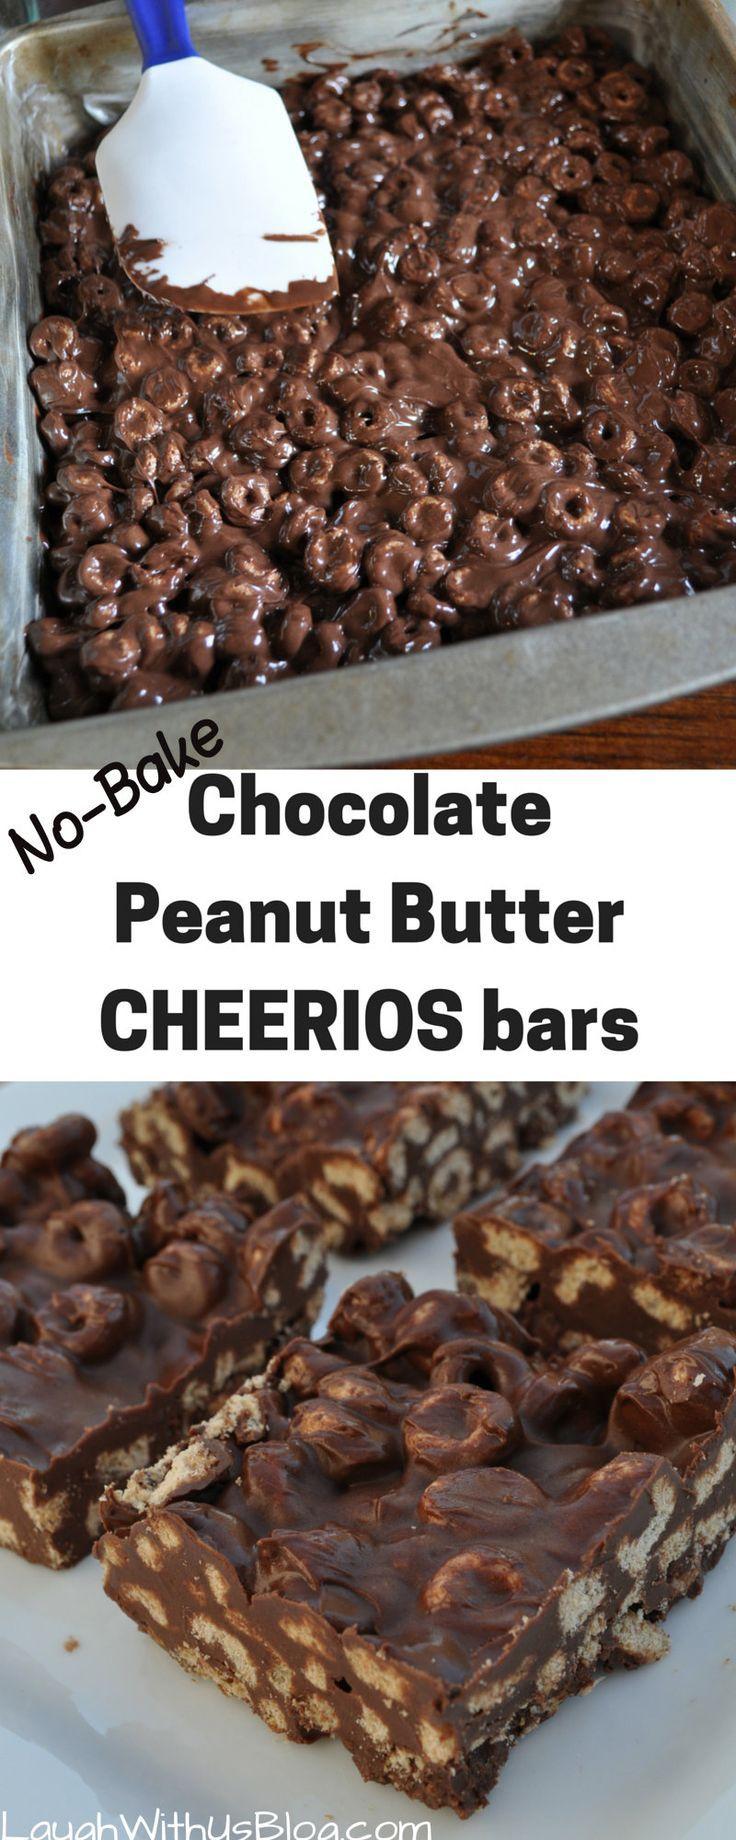 Tastes like a chocolate peanut butter candy bar! Three ingredients. Great KidsInTheKitchen recipe.